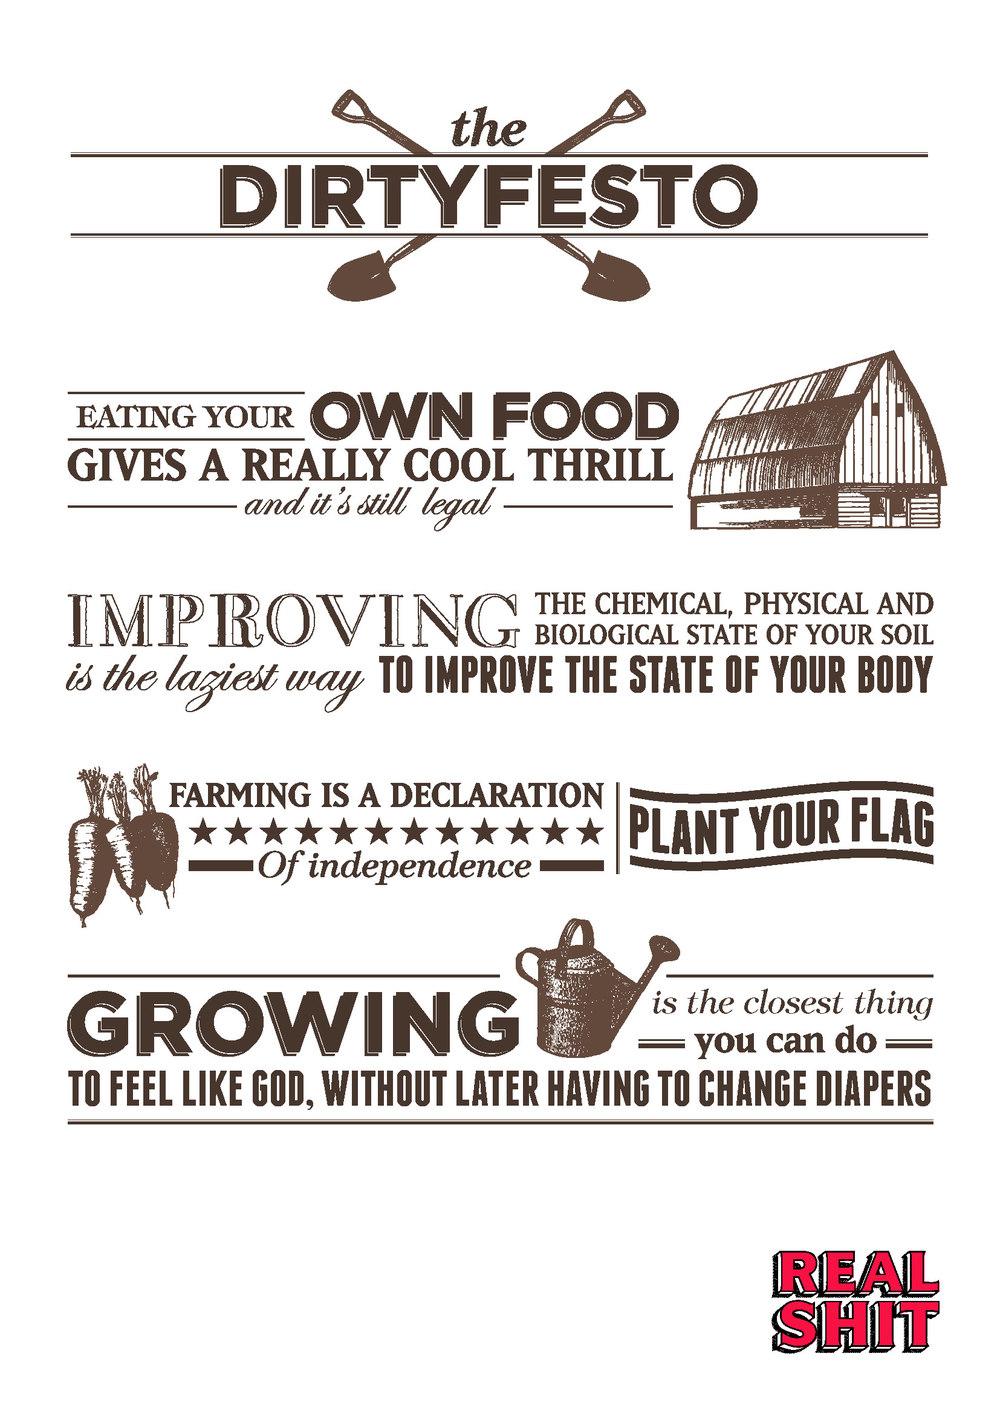 dirtyfesto.jpg